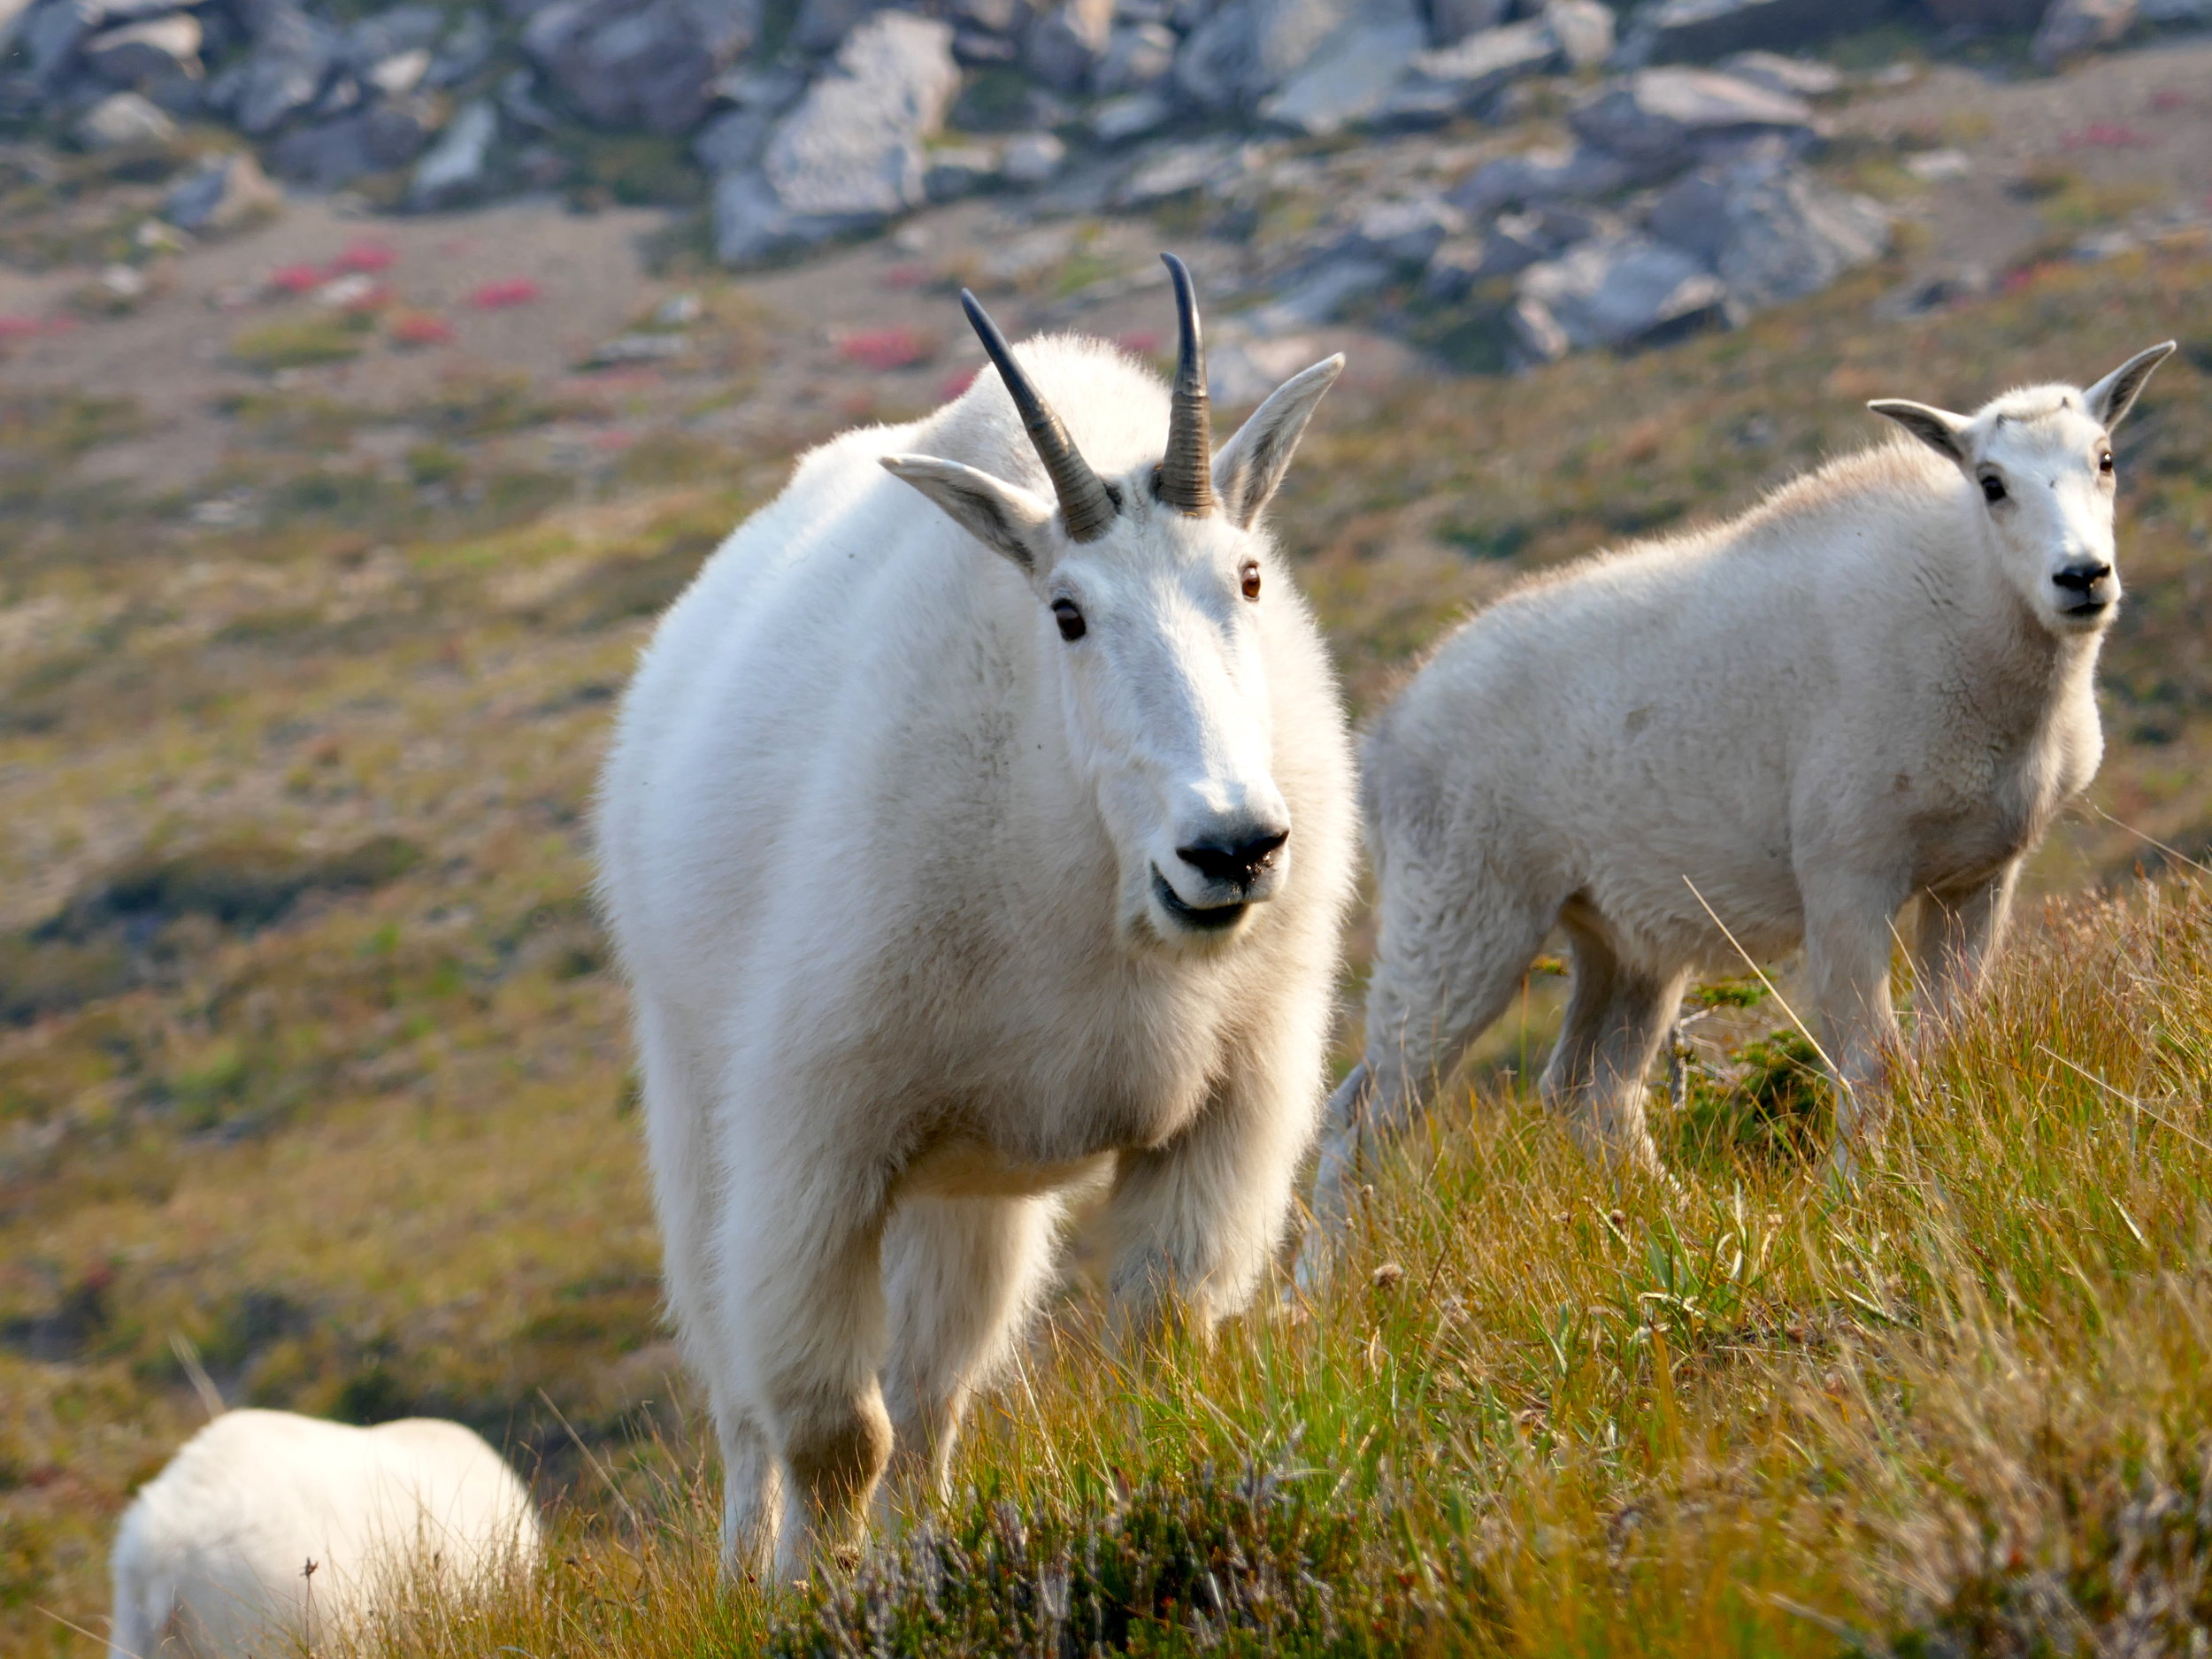 Goats encountered as I near Sunrise on the September Wonderland section hike.